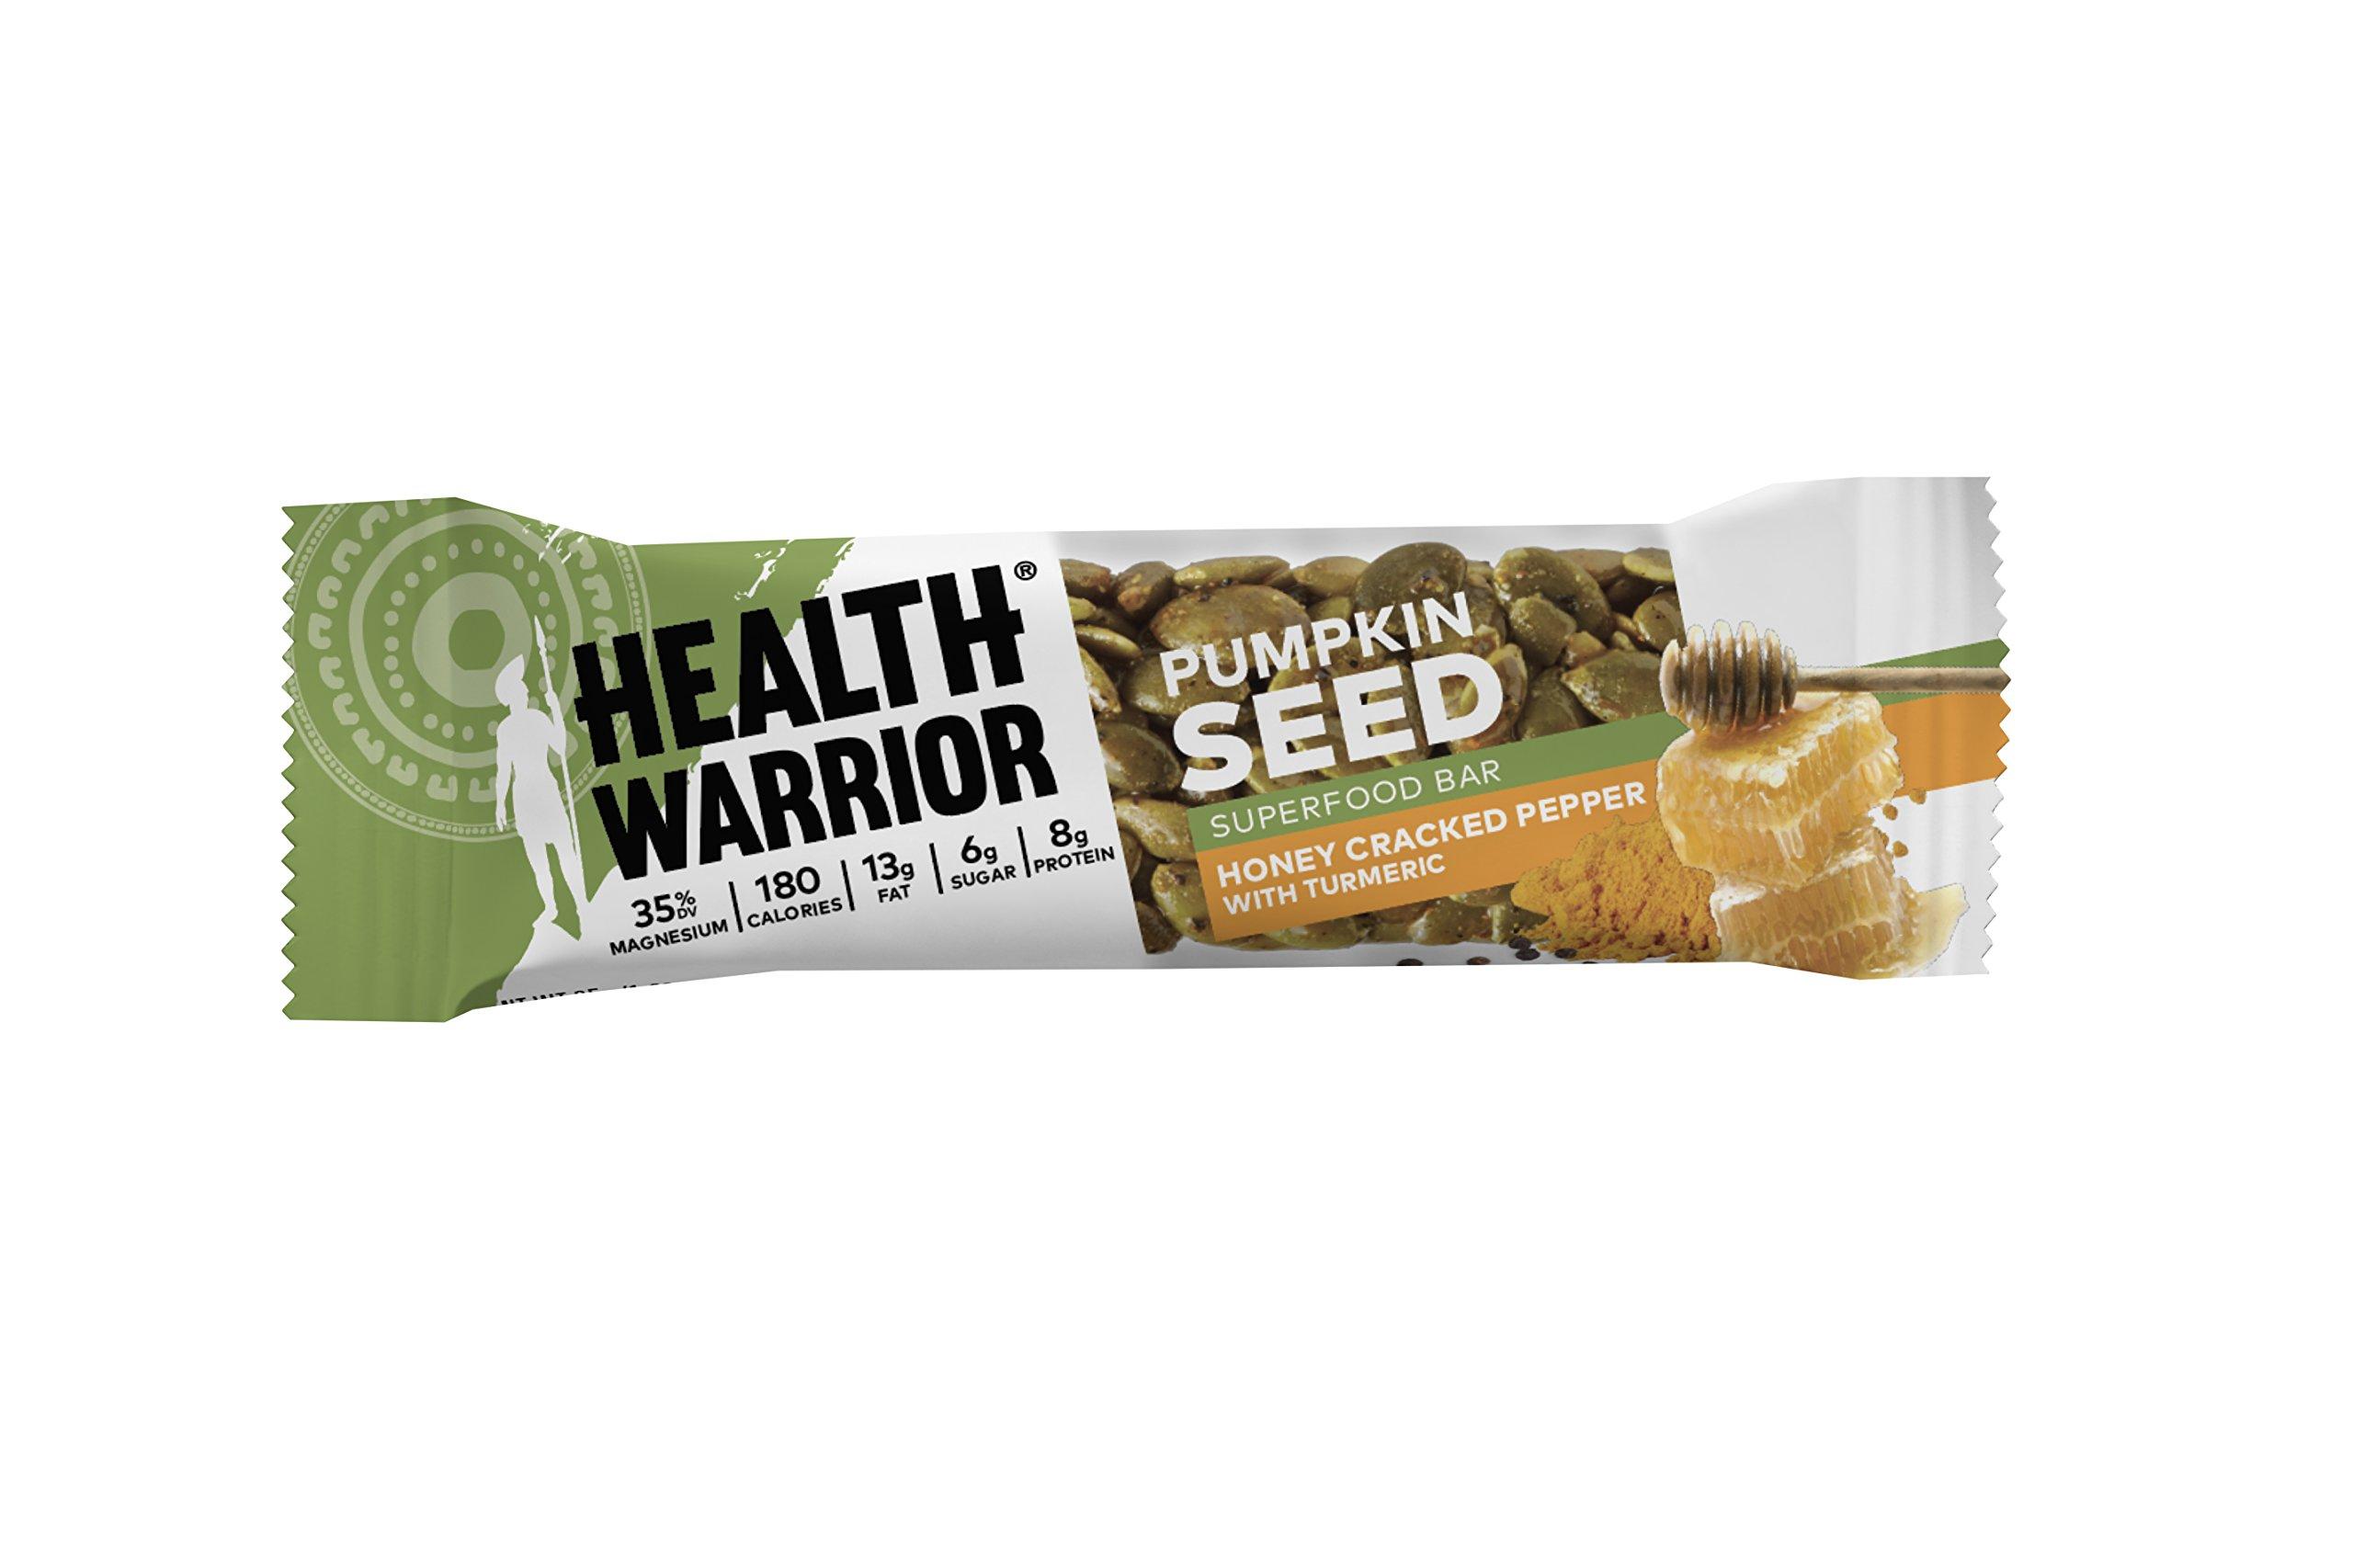 Health Warrior Pumpkin Seed Bars, Honey Cracked Pepper Turmeric, 12 Count, 14.8 Oz